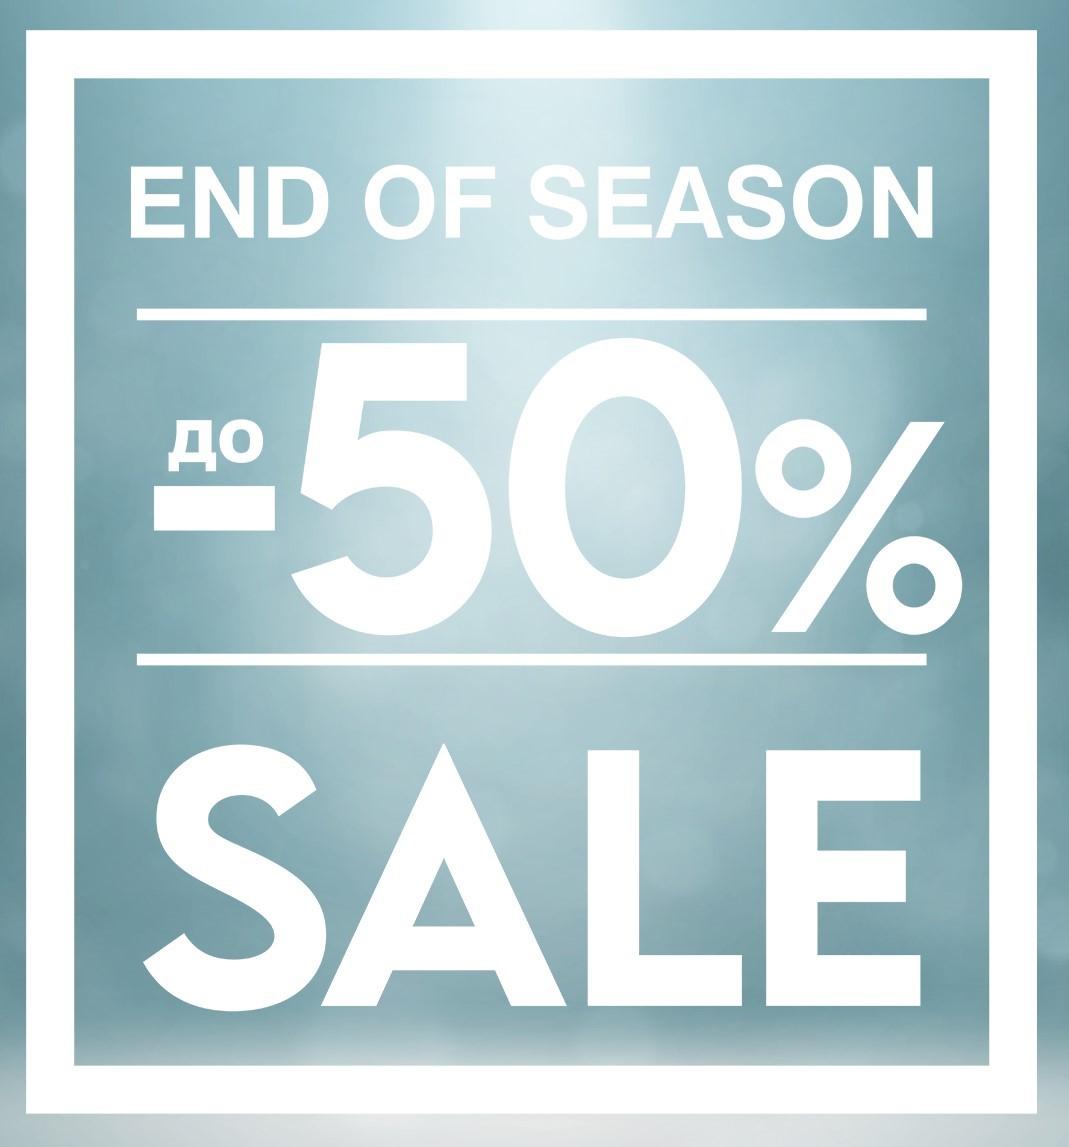 END OF SEASON SALE в магазини Scandal и Fusion